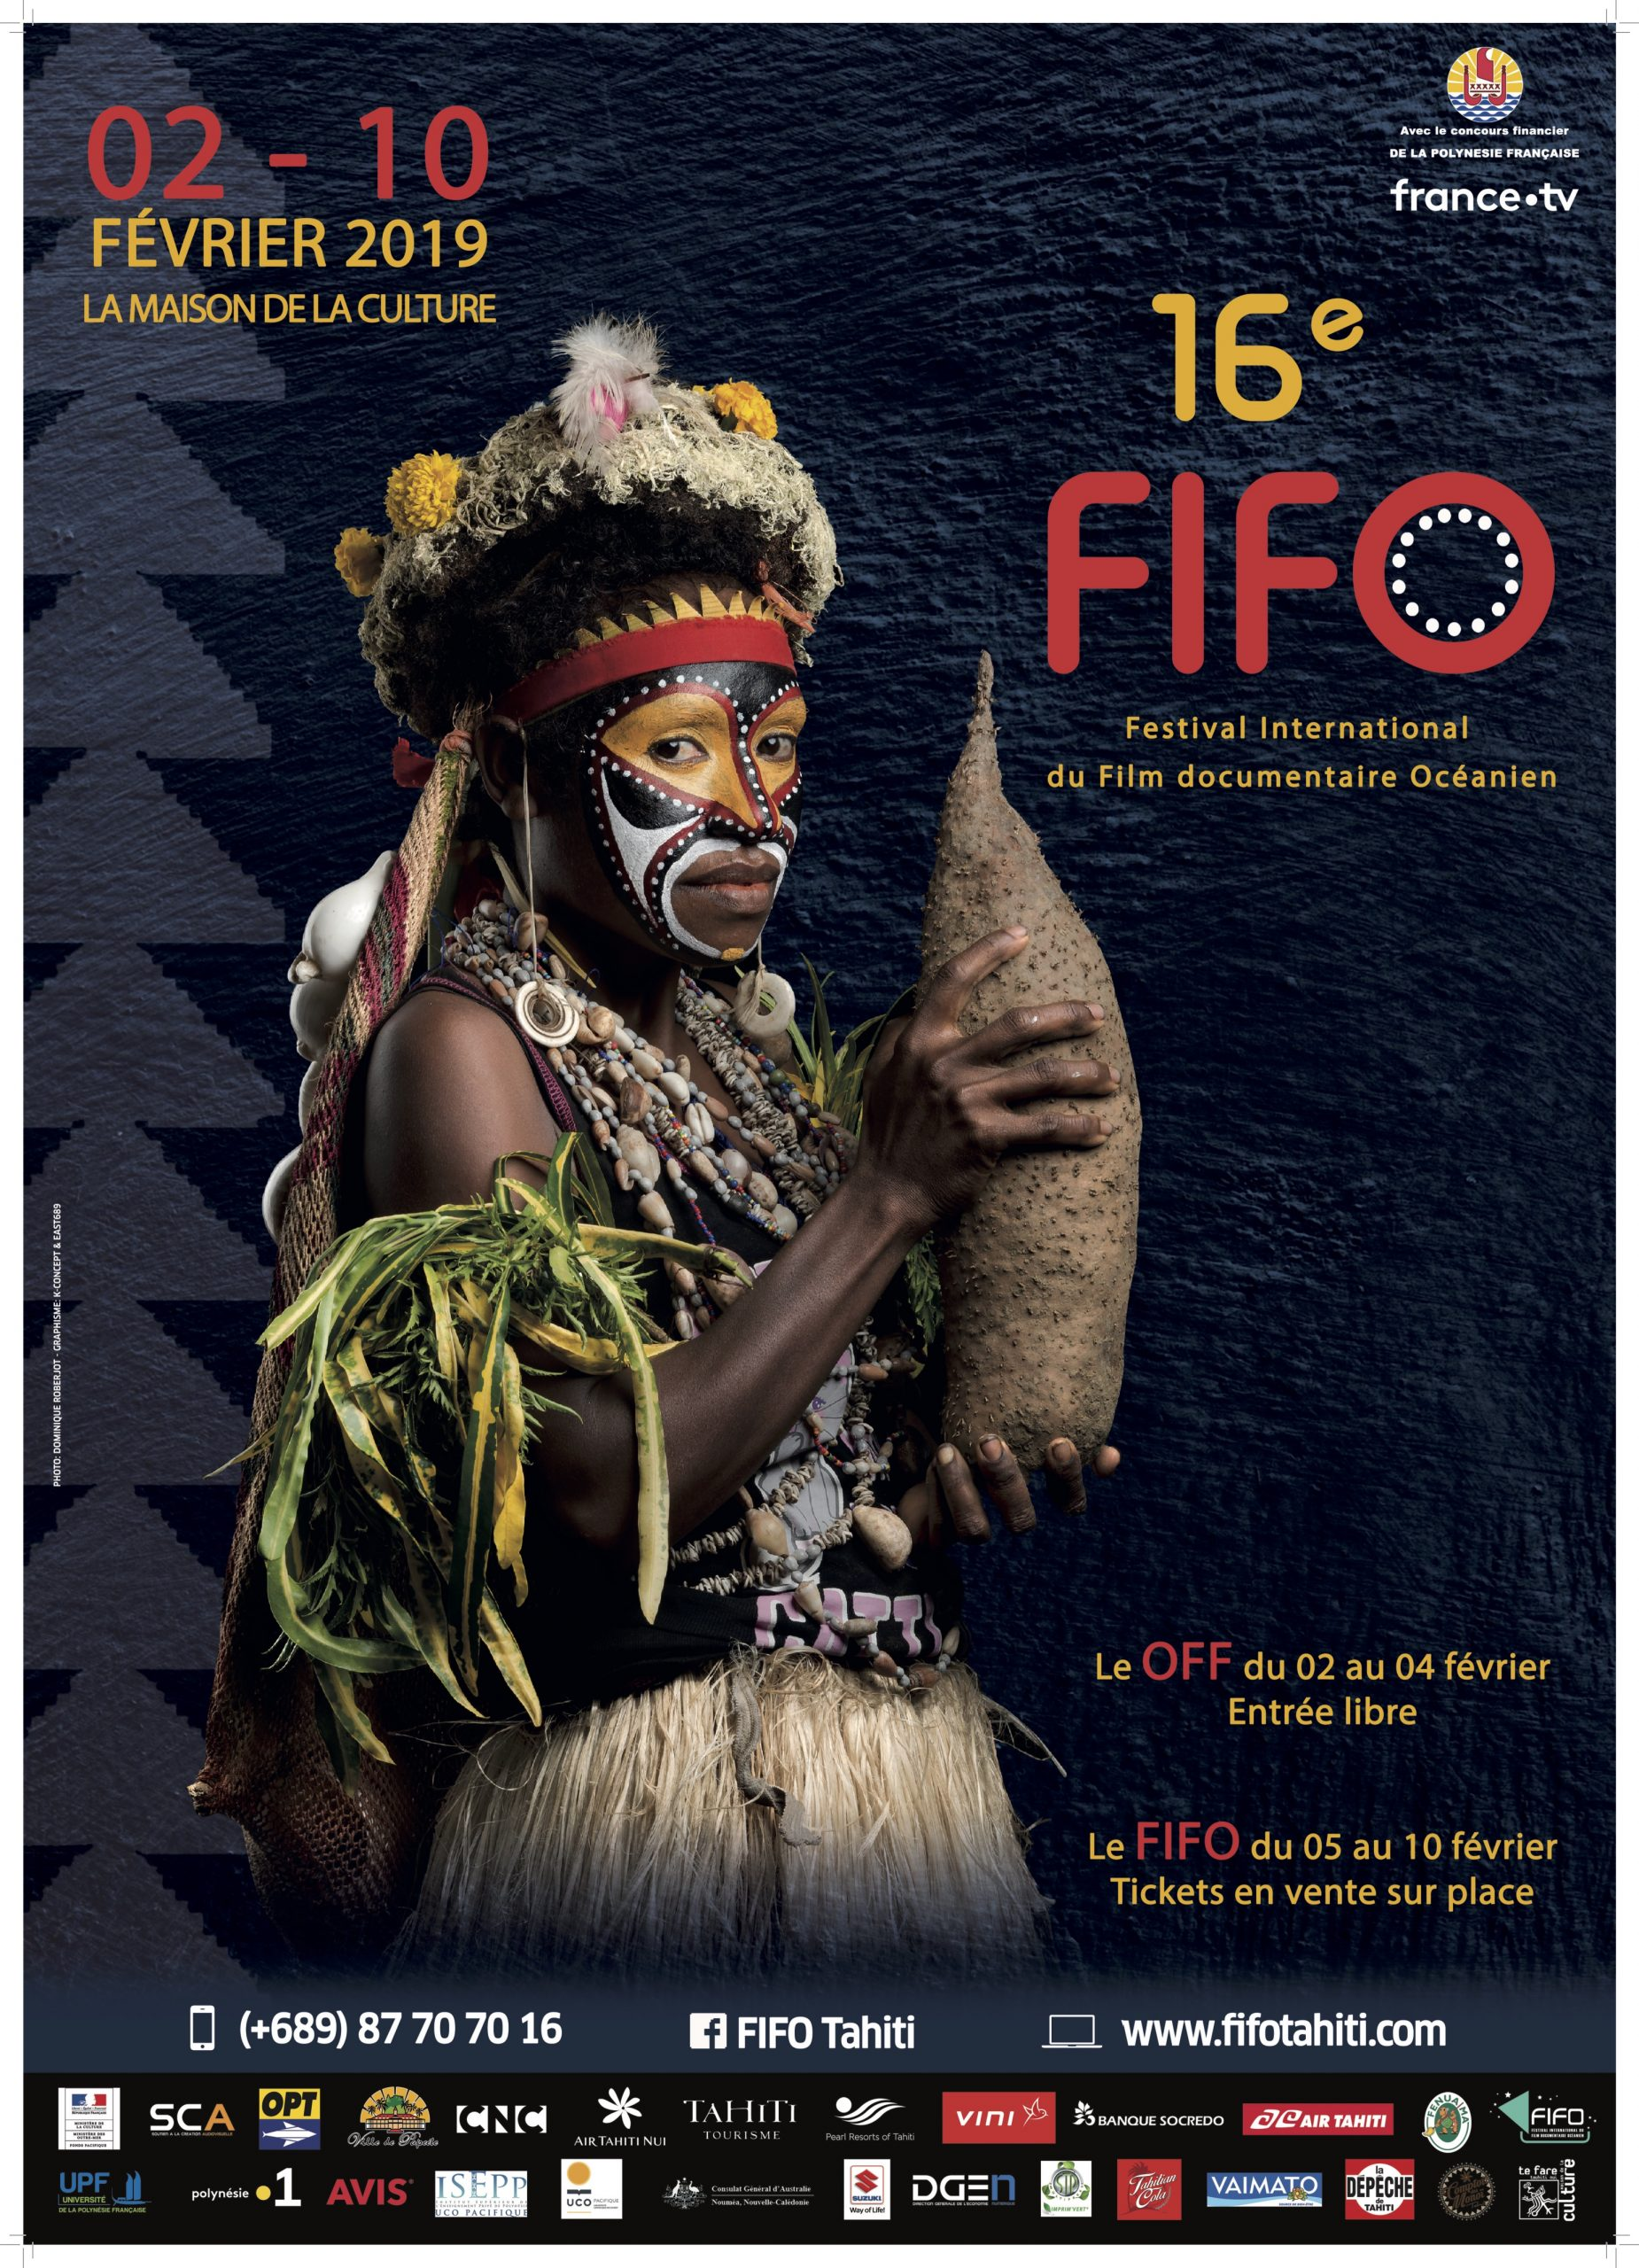 AFFICHE FIFO 2019